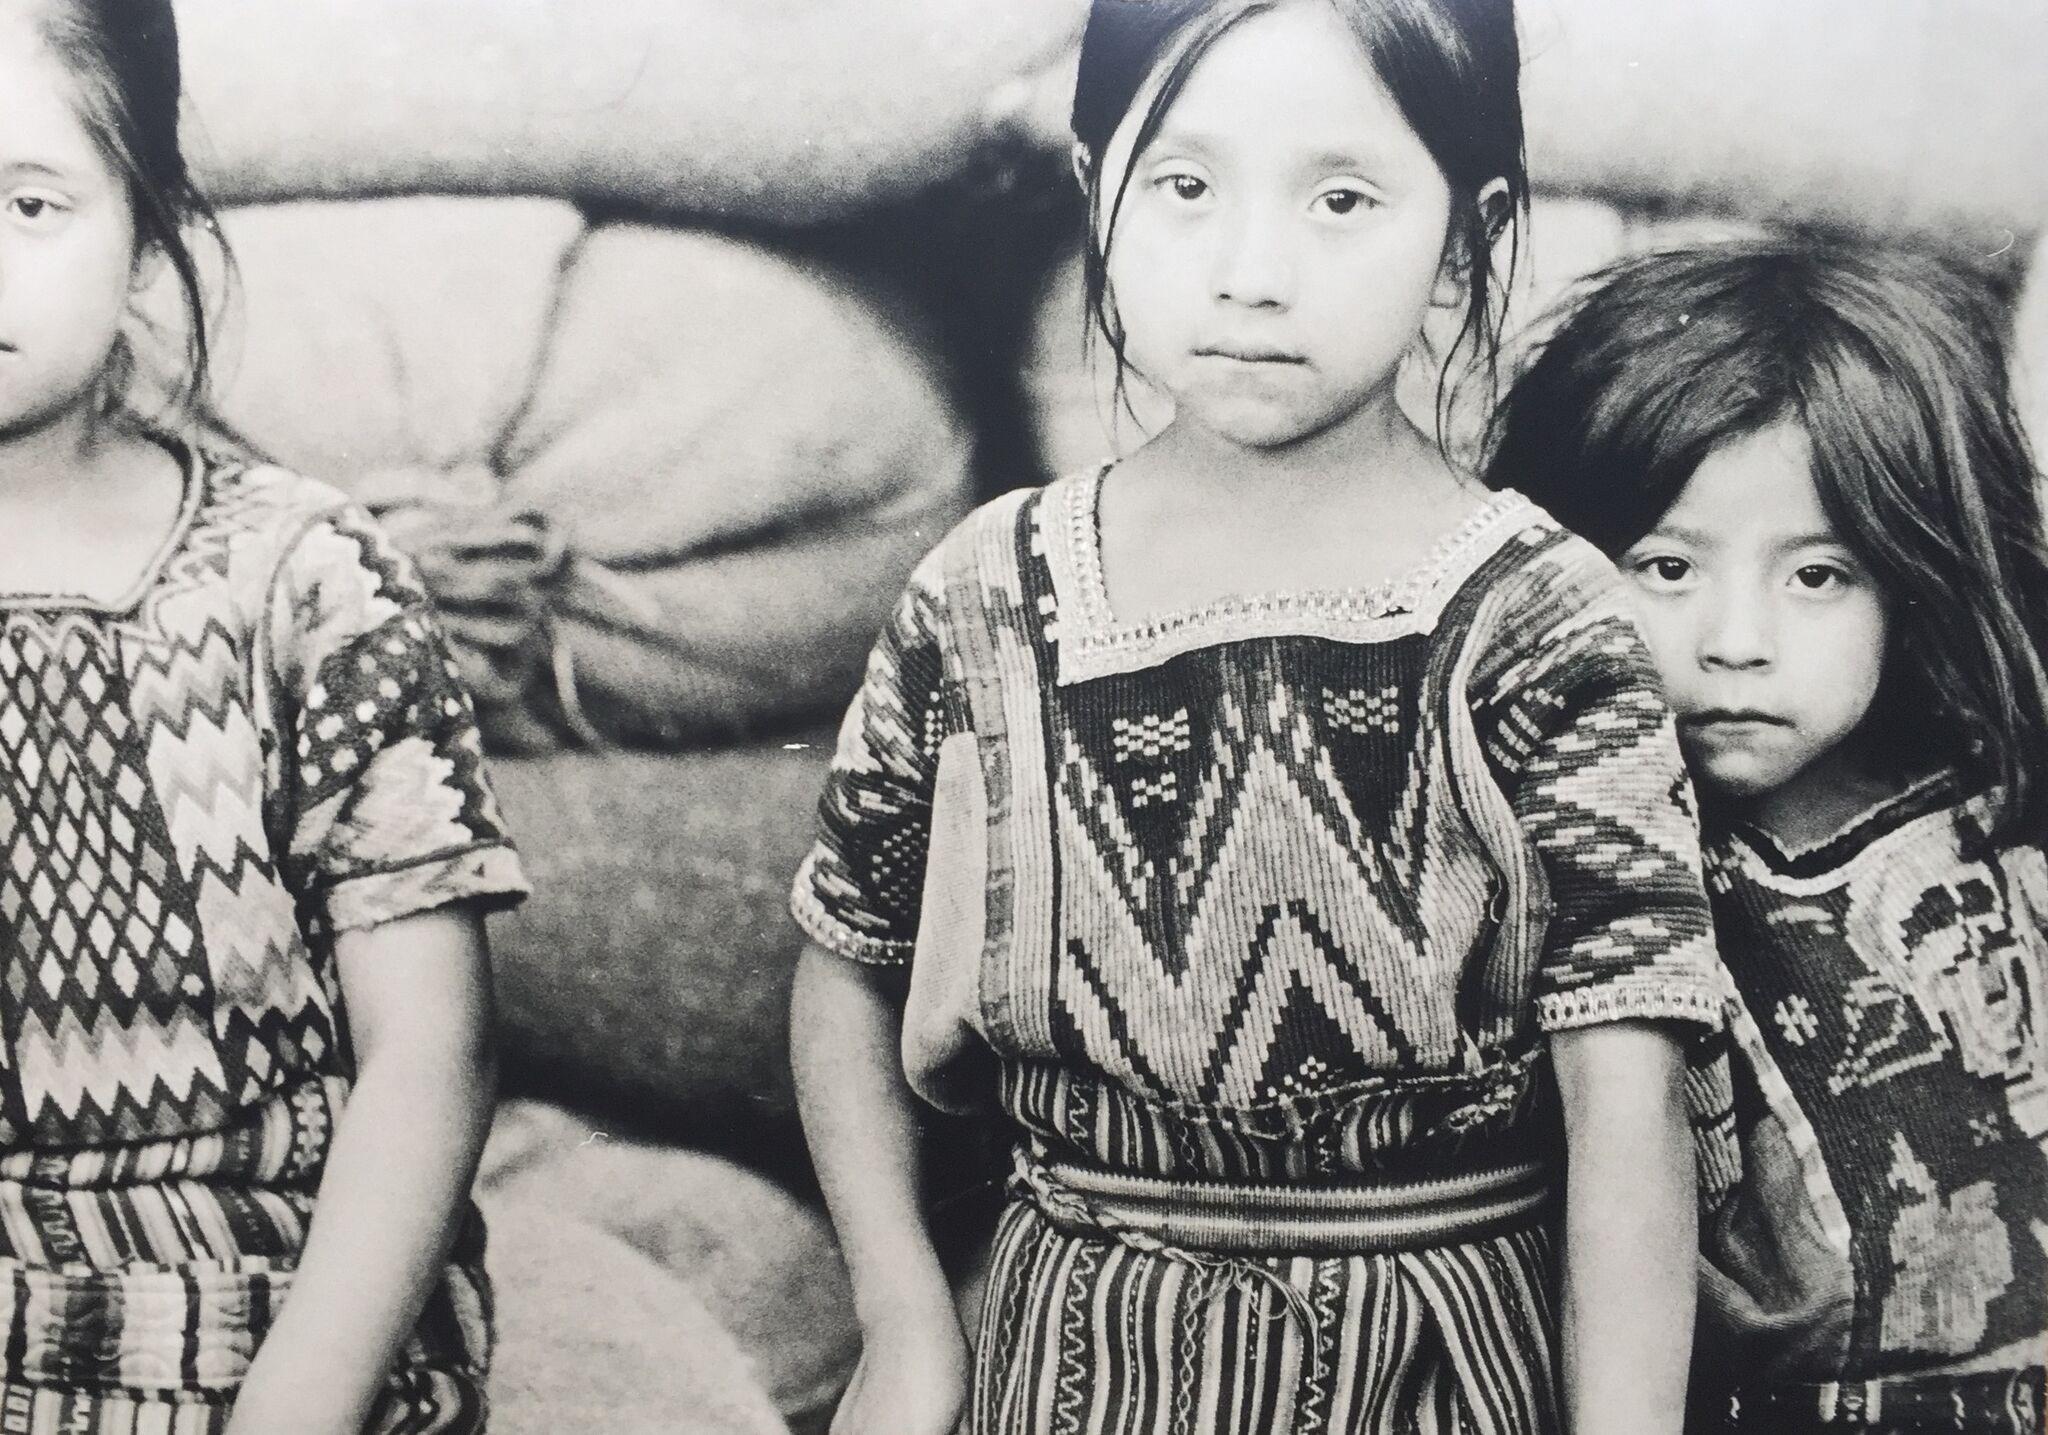 Untitled, Black & White Photo of Children